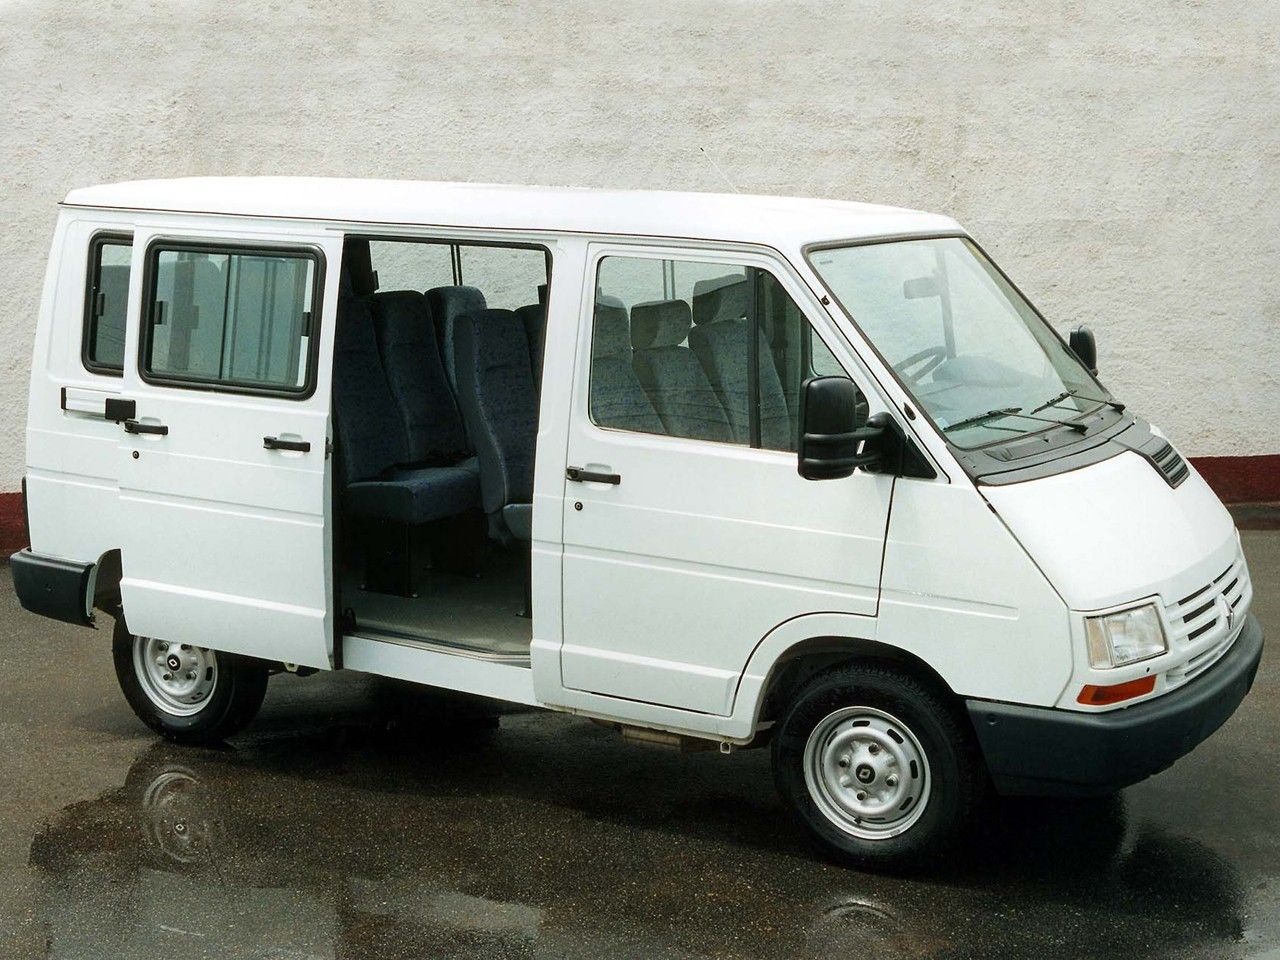 E350 Superduty Van Custom Sell Used 2000 Ford E350 Custom Van